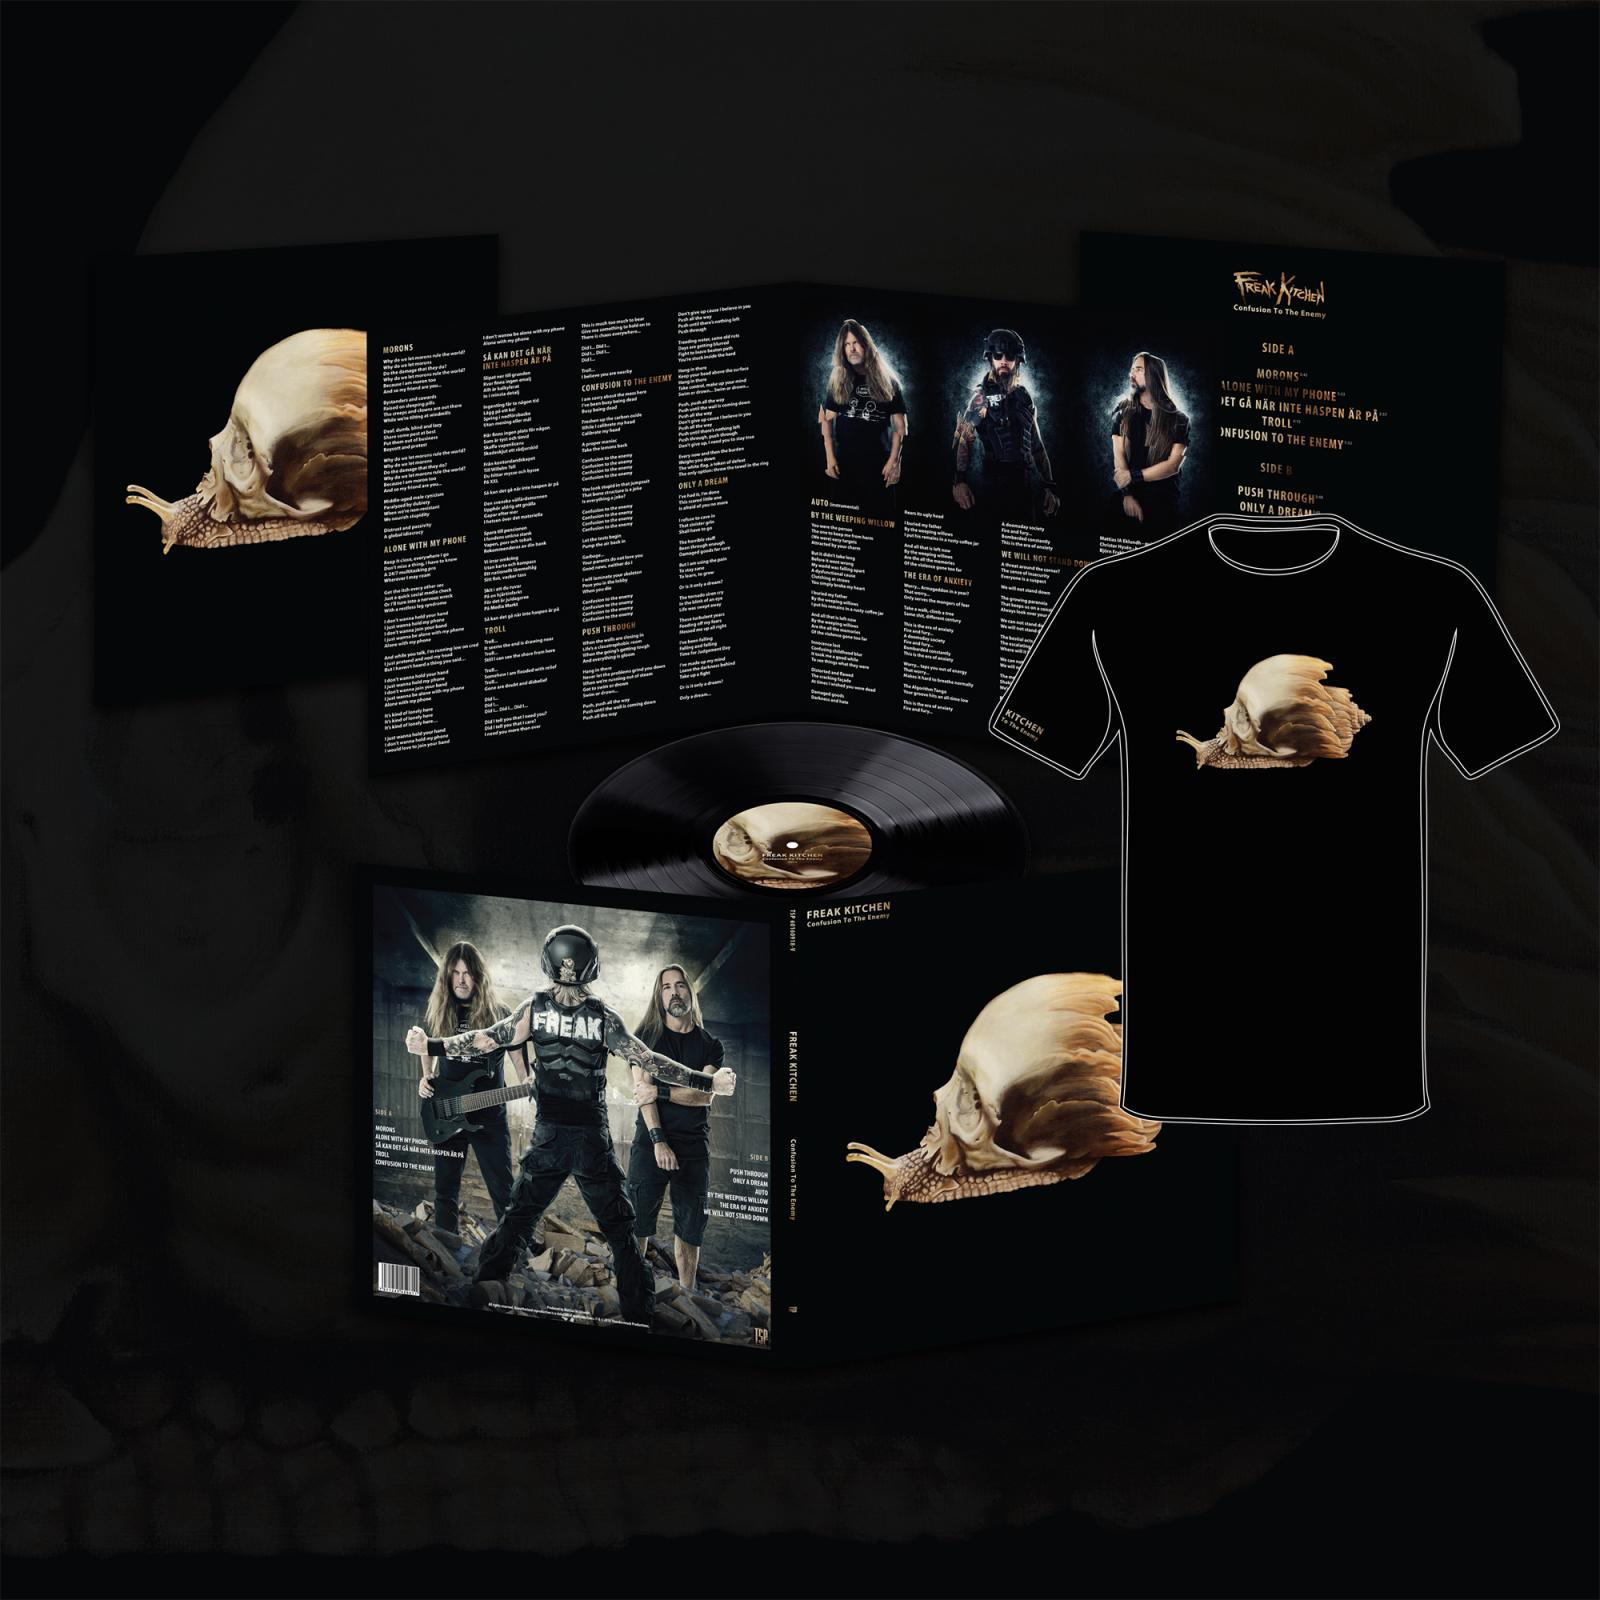 Vinyl LP and T-shirt